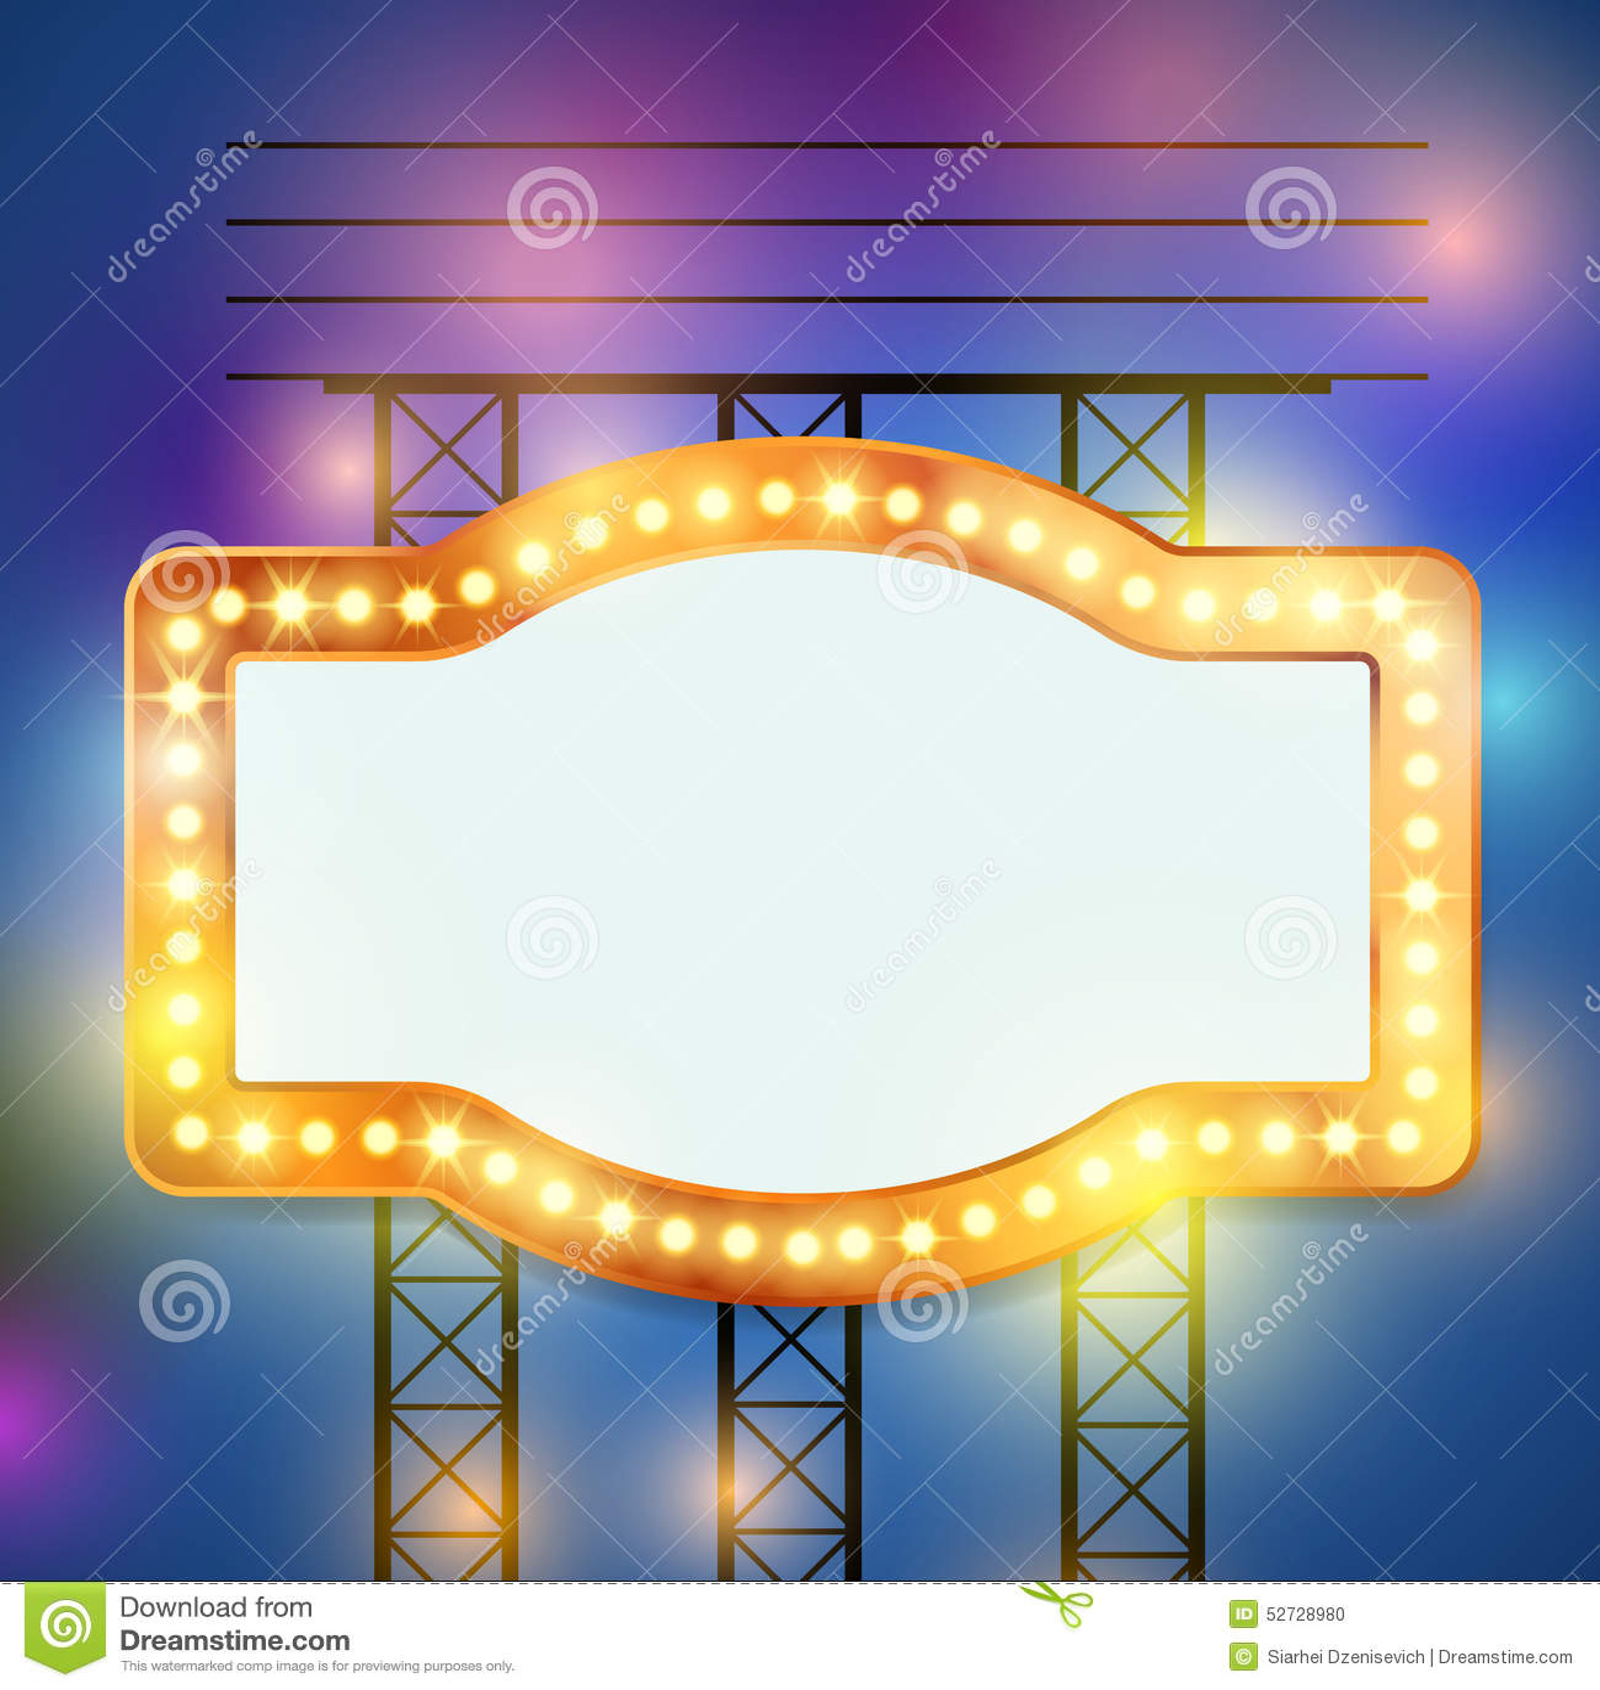 Retro Bulb Circus Cinema Light Sign Template Vector Illustration